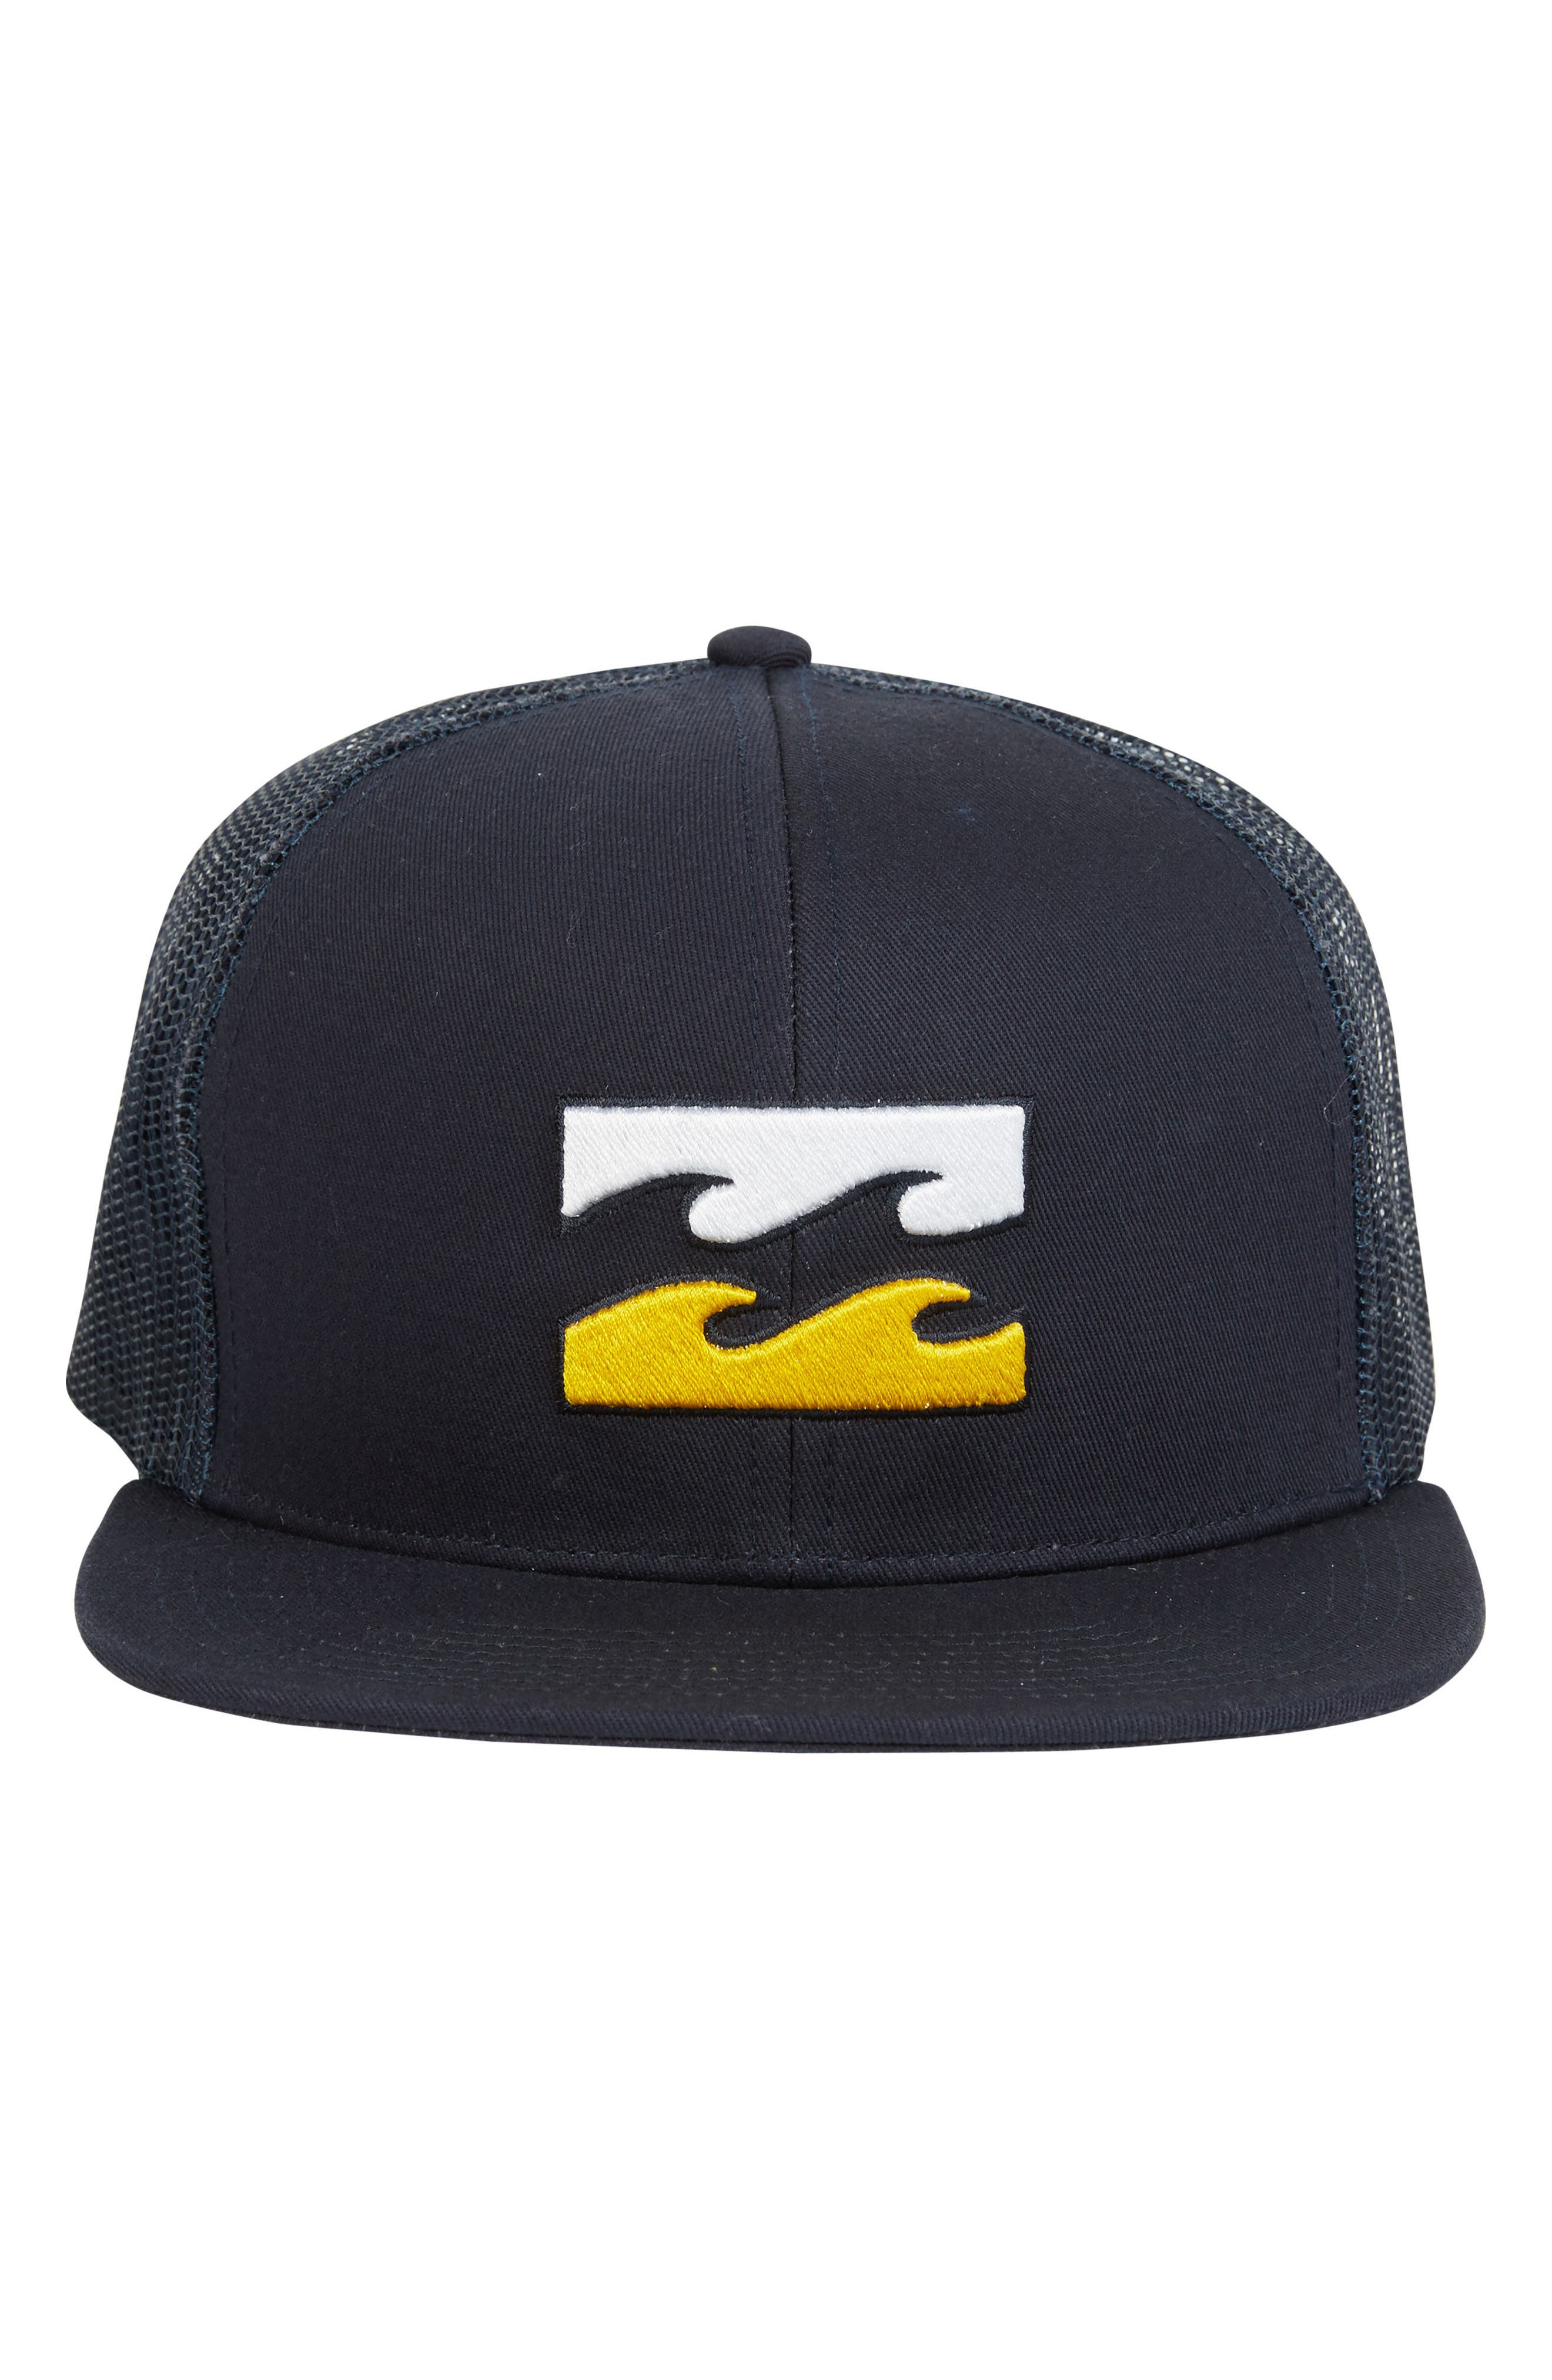 All Day Trucker Hat,                             Alternate thumbnail 15, color,